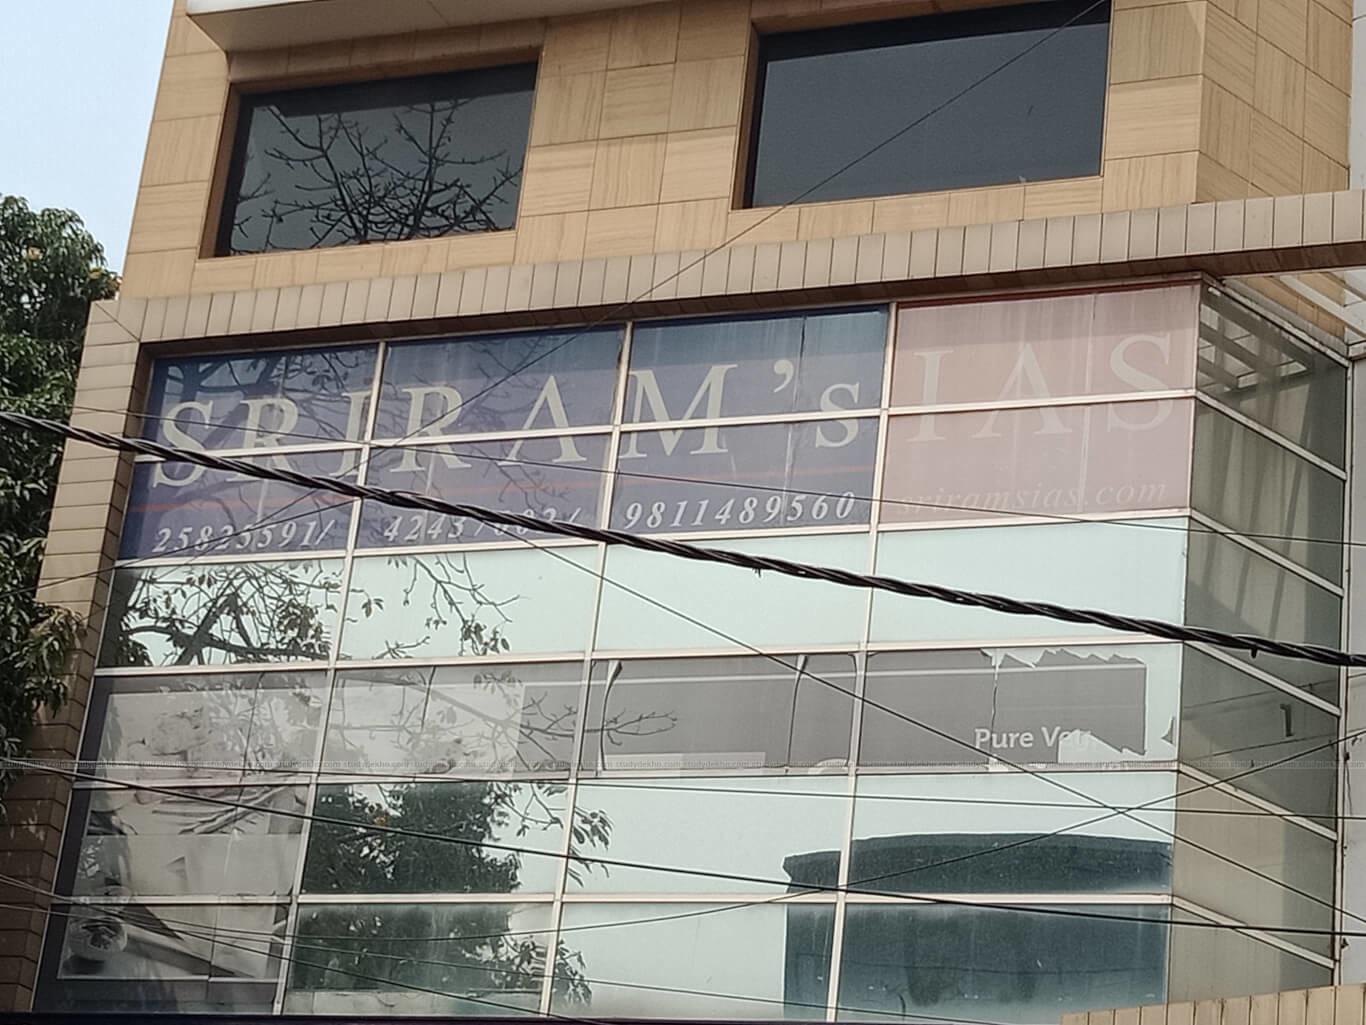 Sriram's IAS Gallery